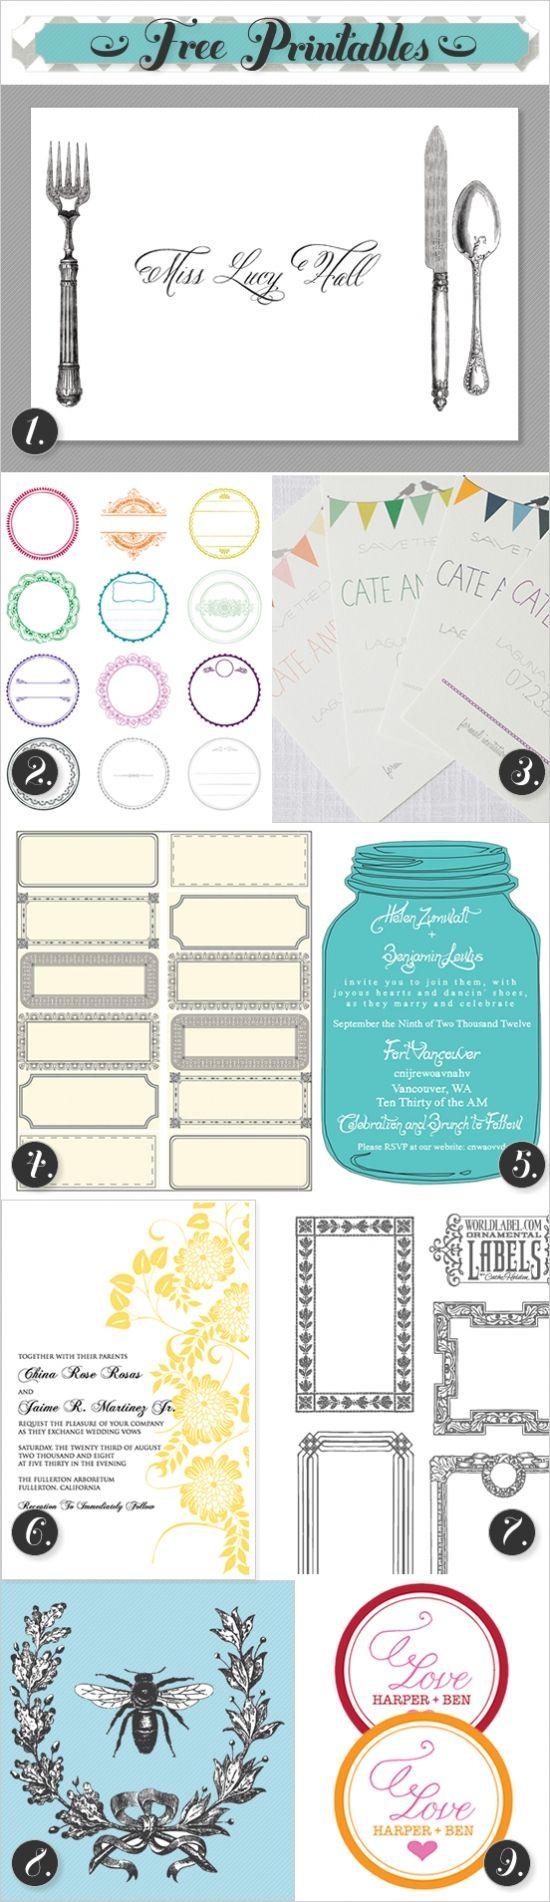 printable labels, etc